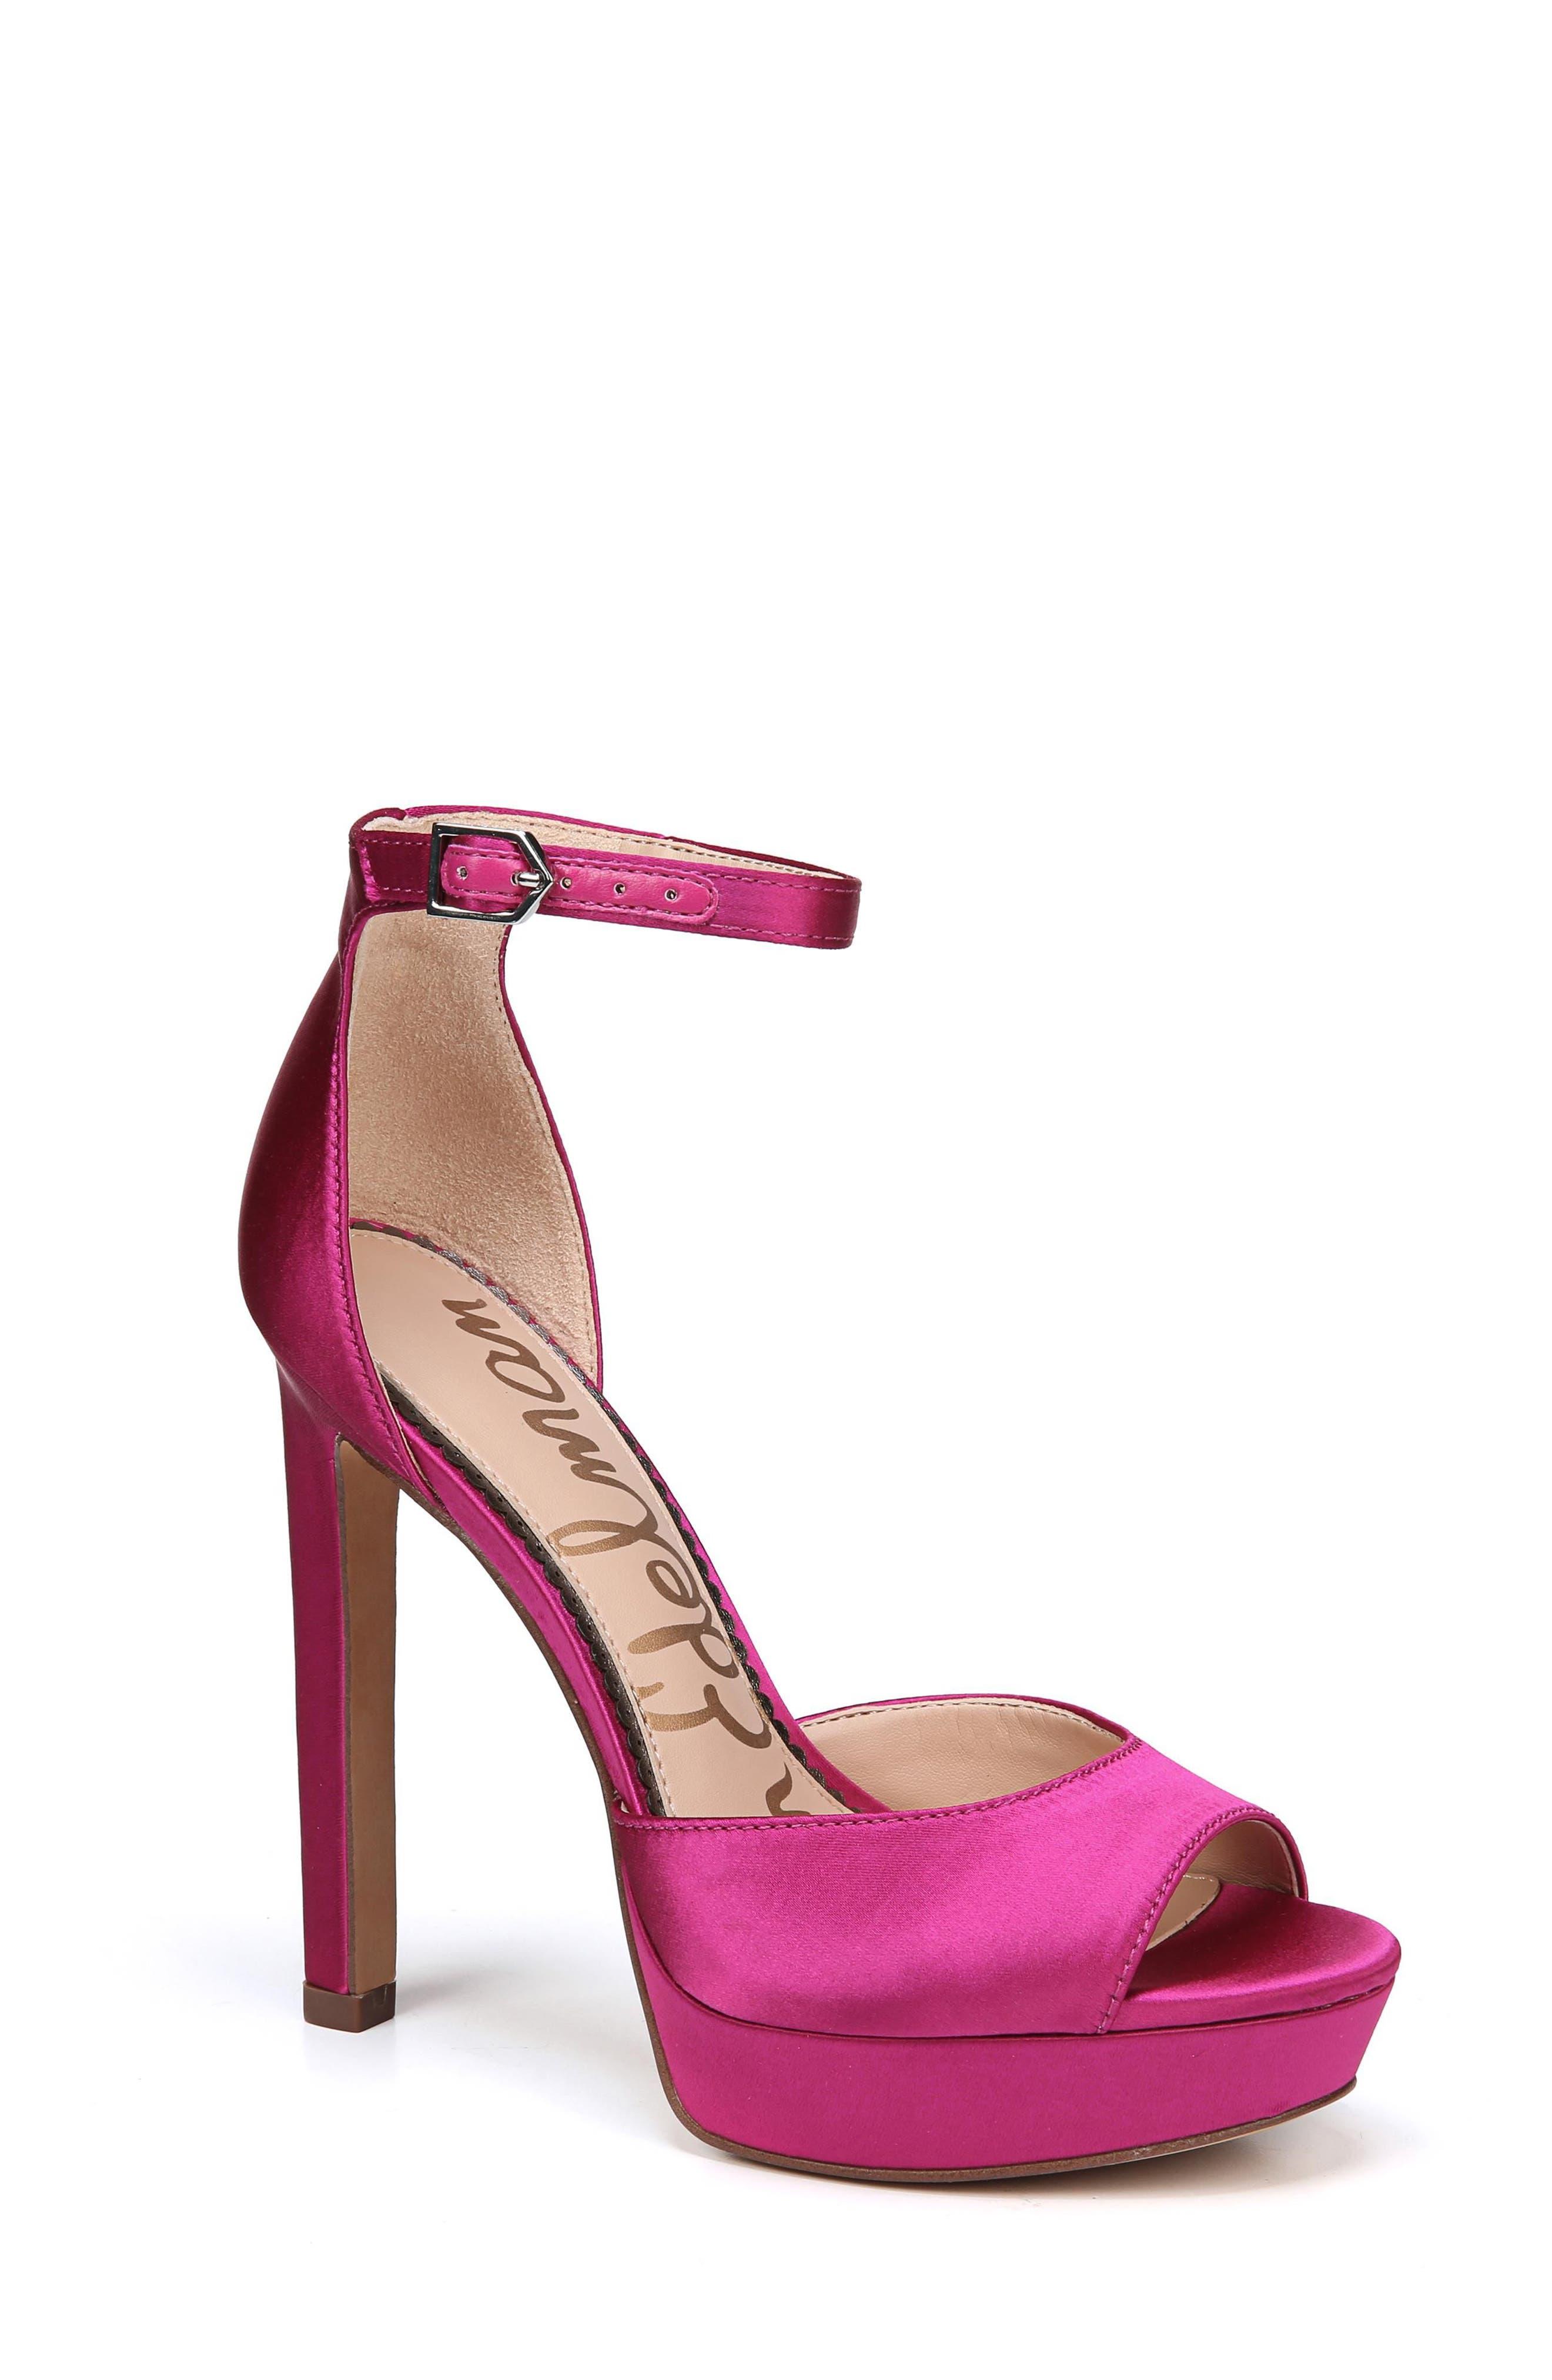 Alternate Image 1 Selected - Sam Edelman Wallace Platform Sandal (Women)